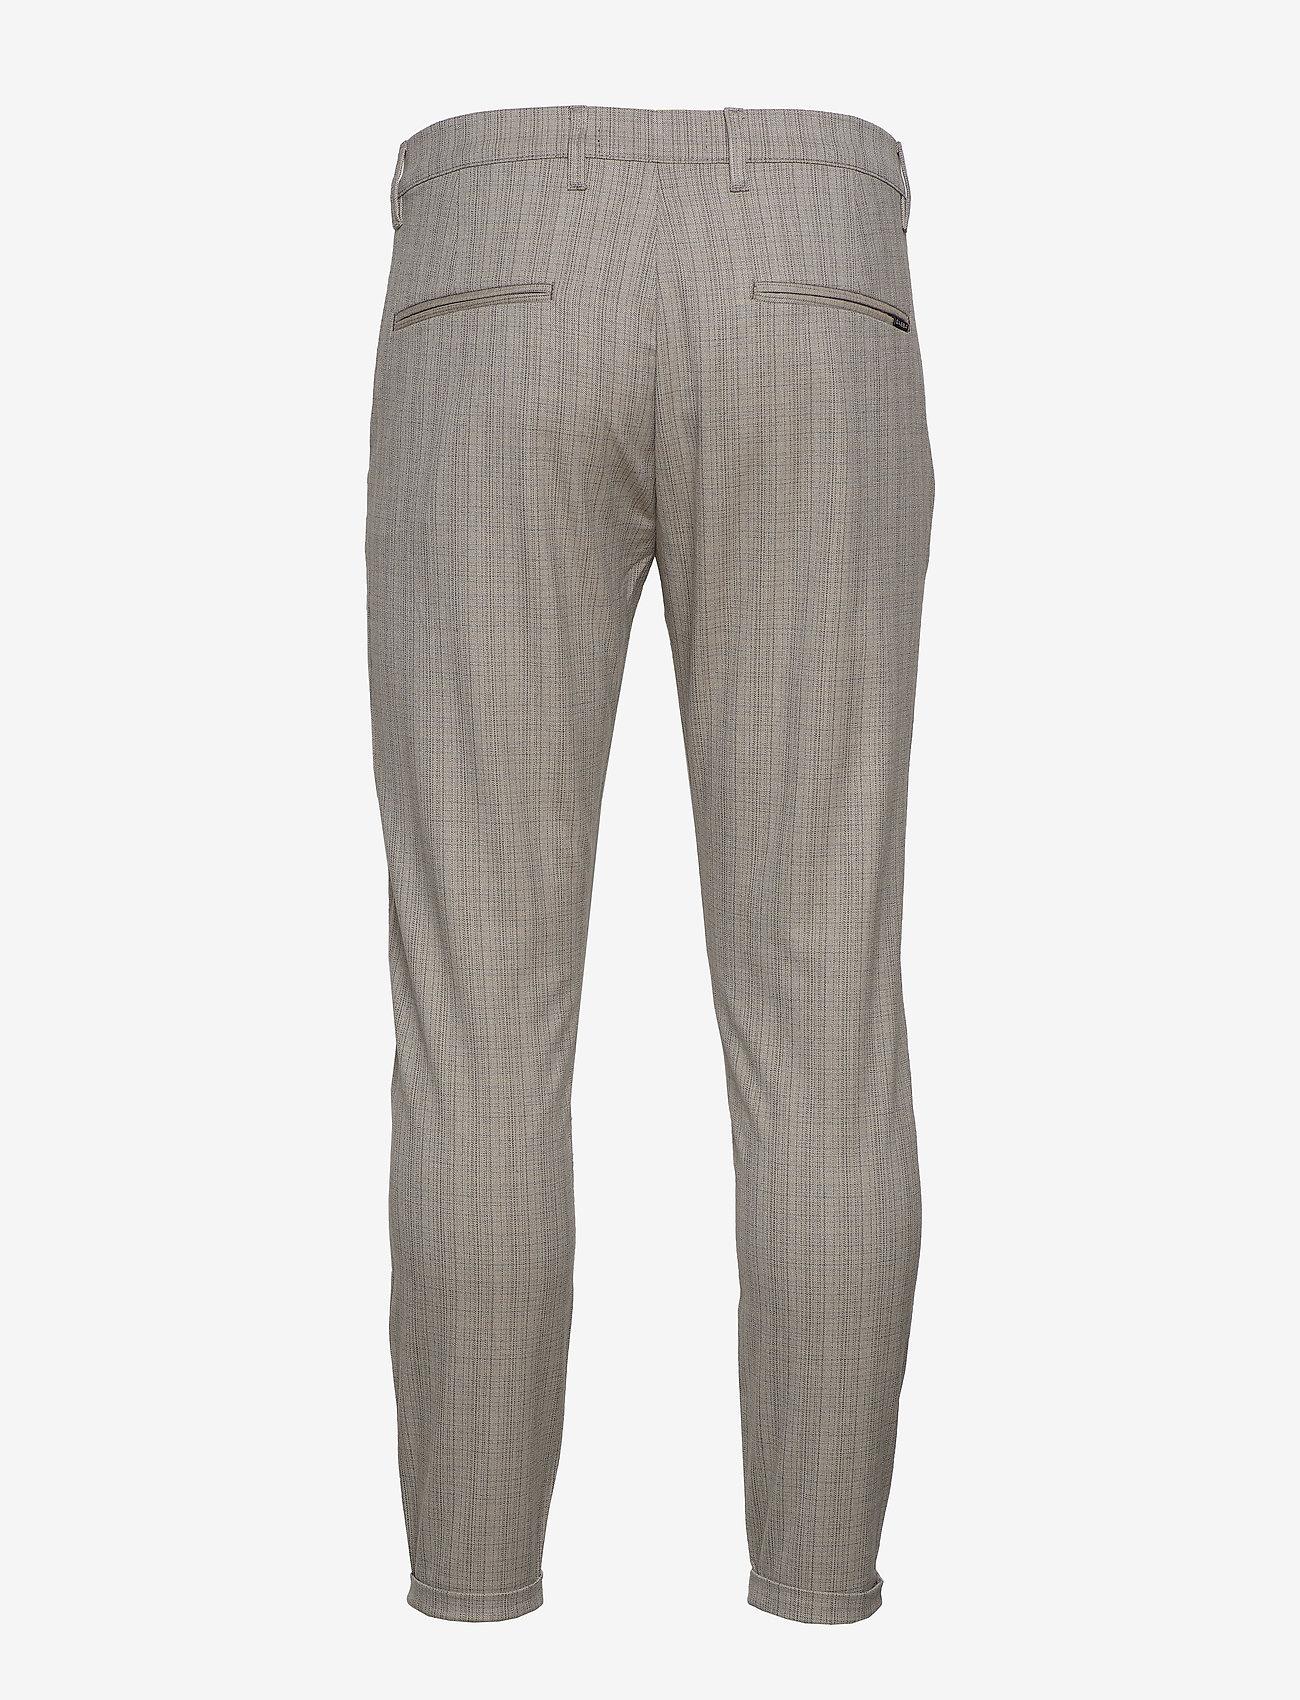 Gabba - Pisa Cross Pant - chinos - lt. sand - 1